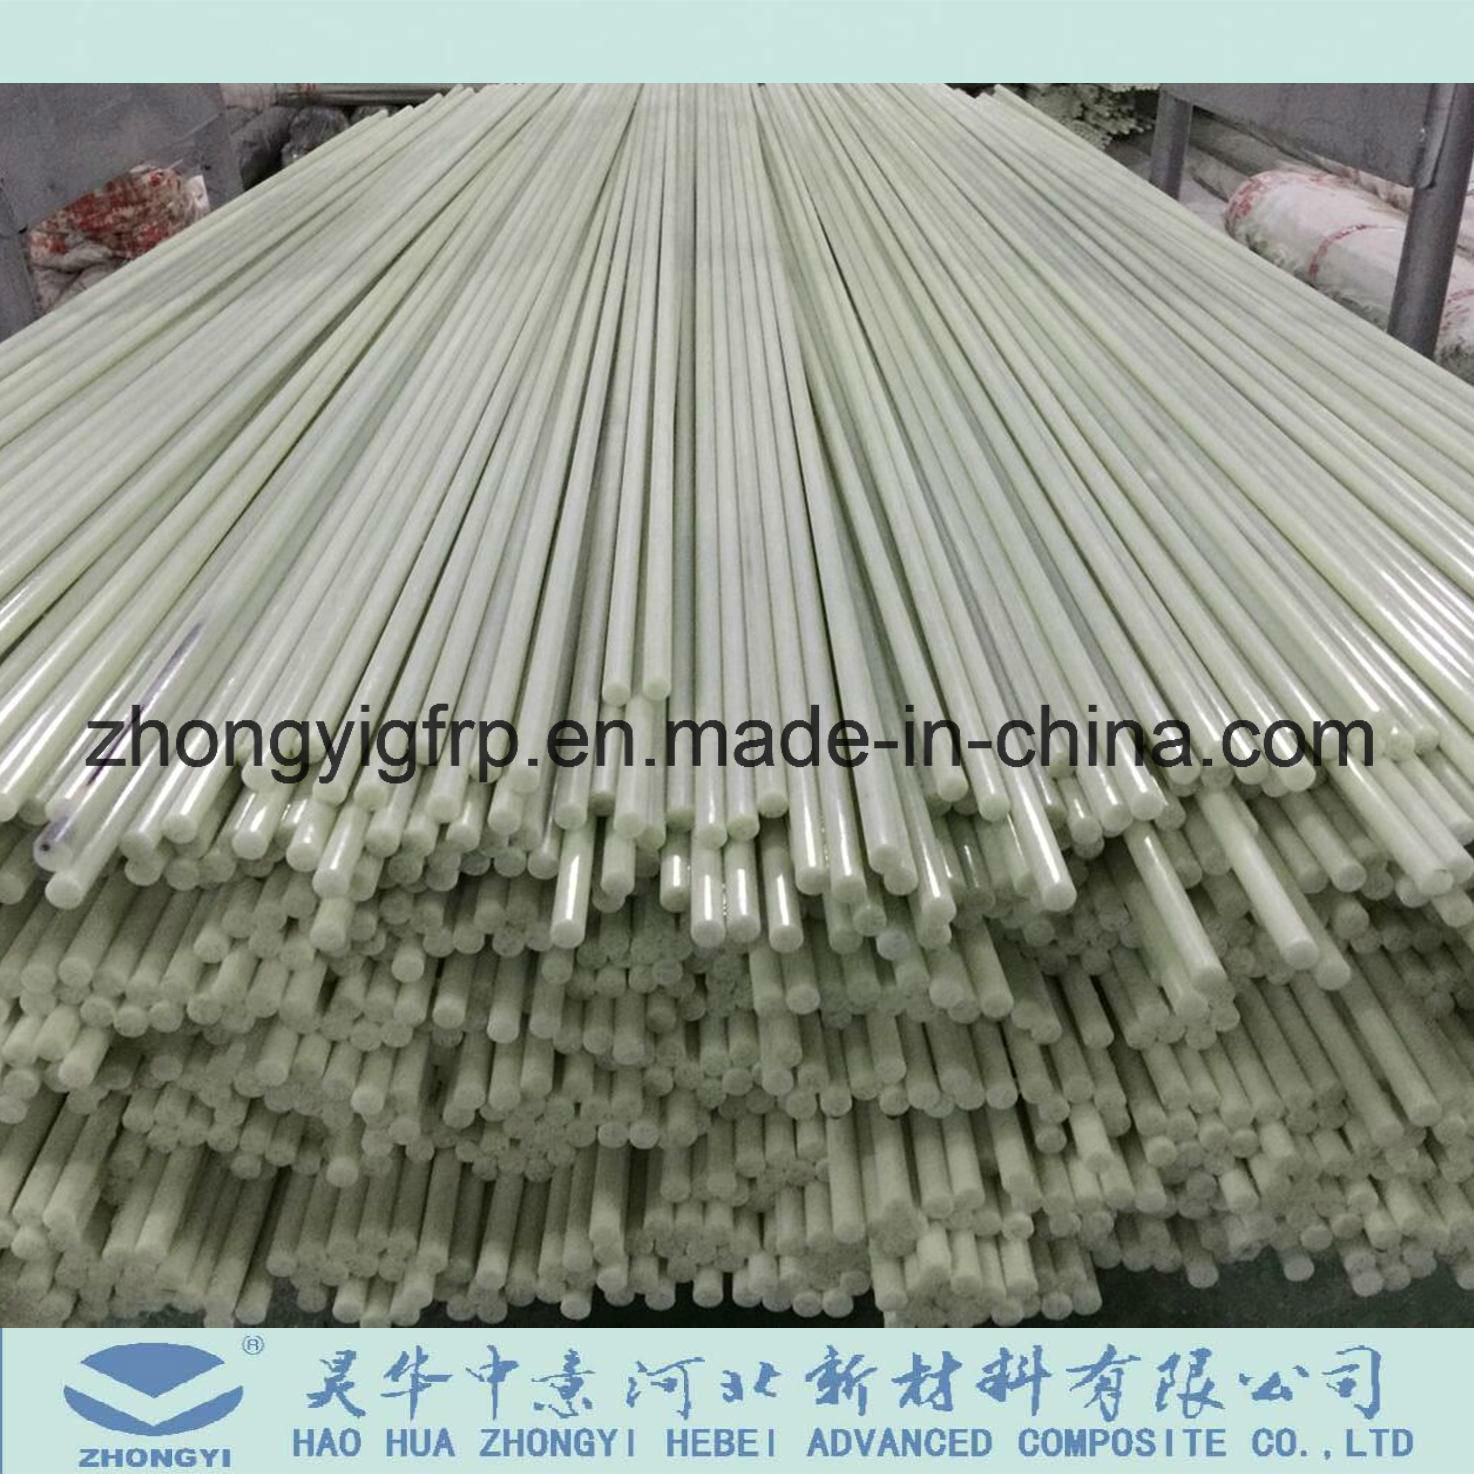 china frp pipe frp tank frp vessel supplier haohua zhongyi hebei advanced composite co ltd